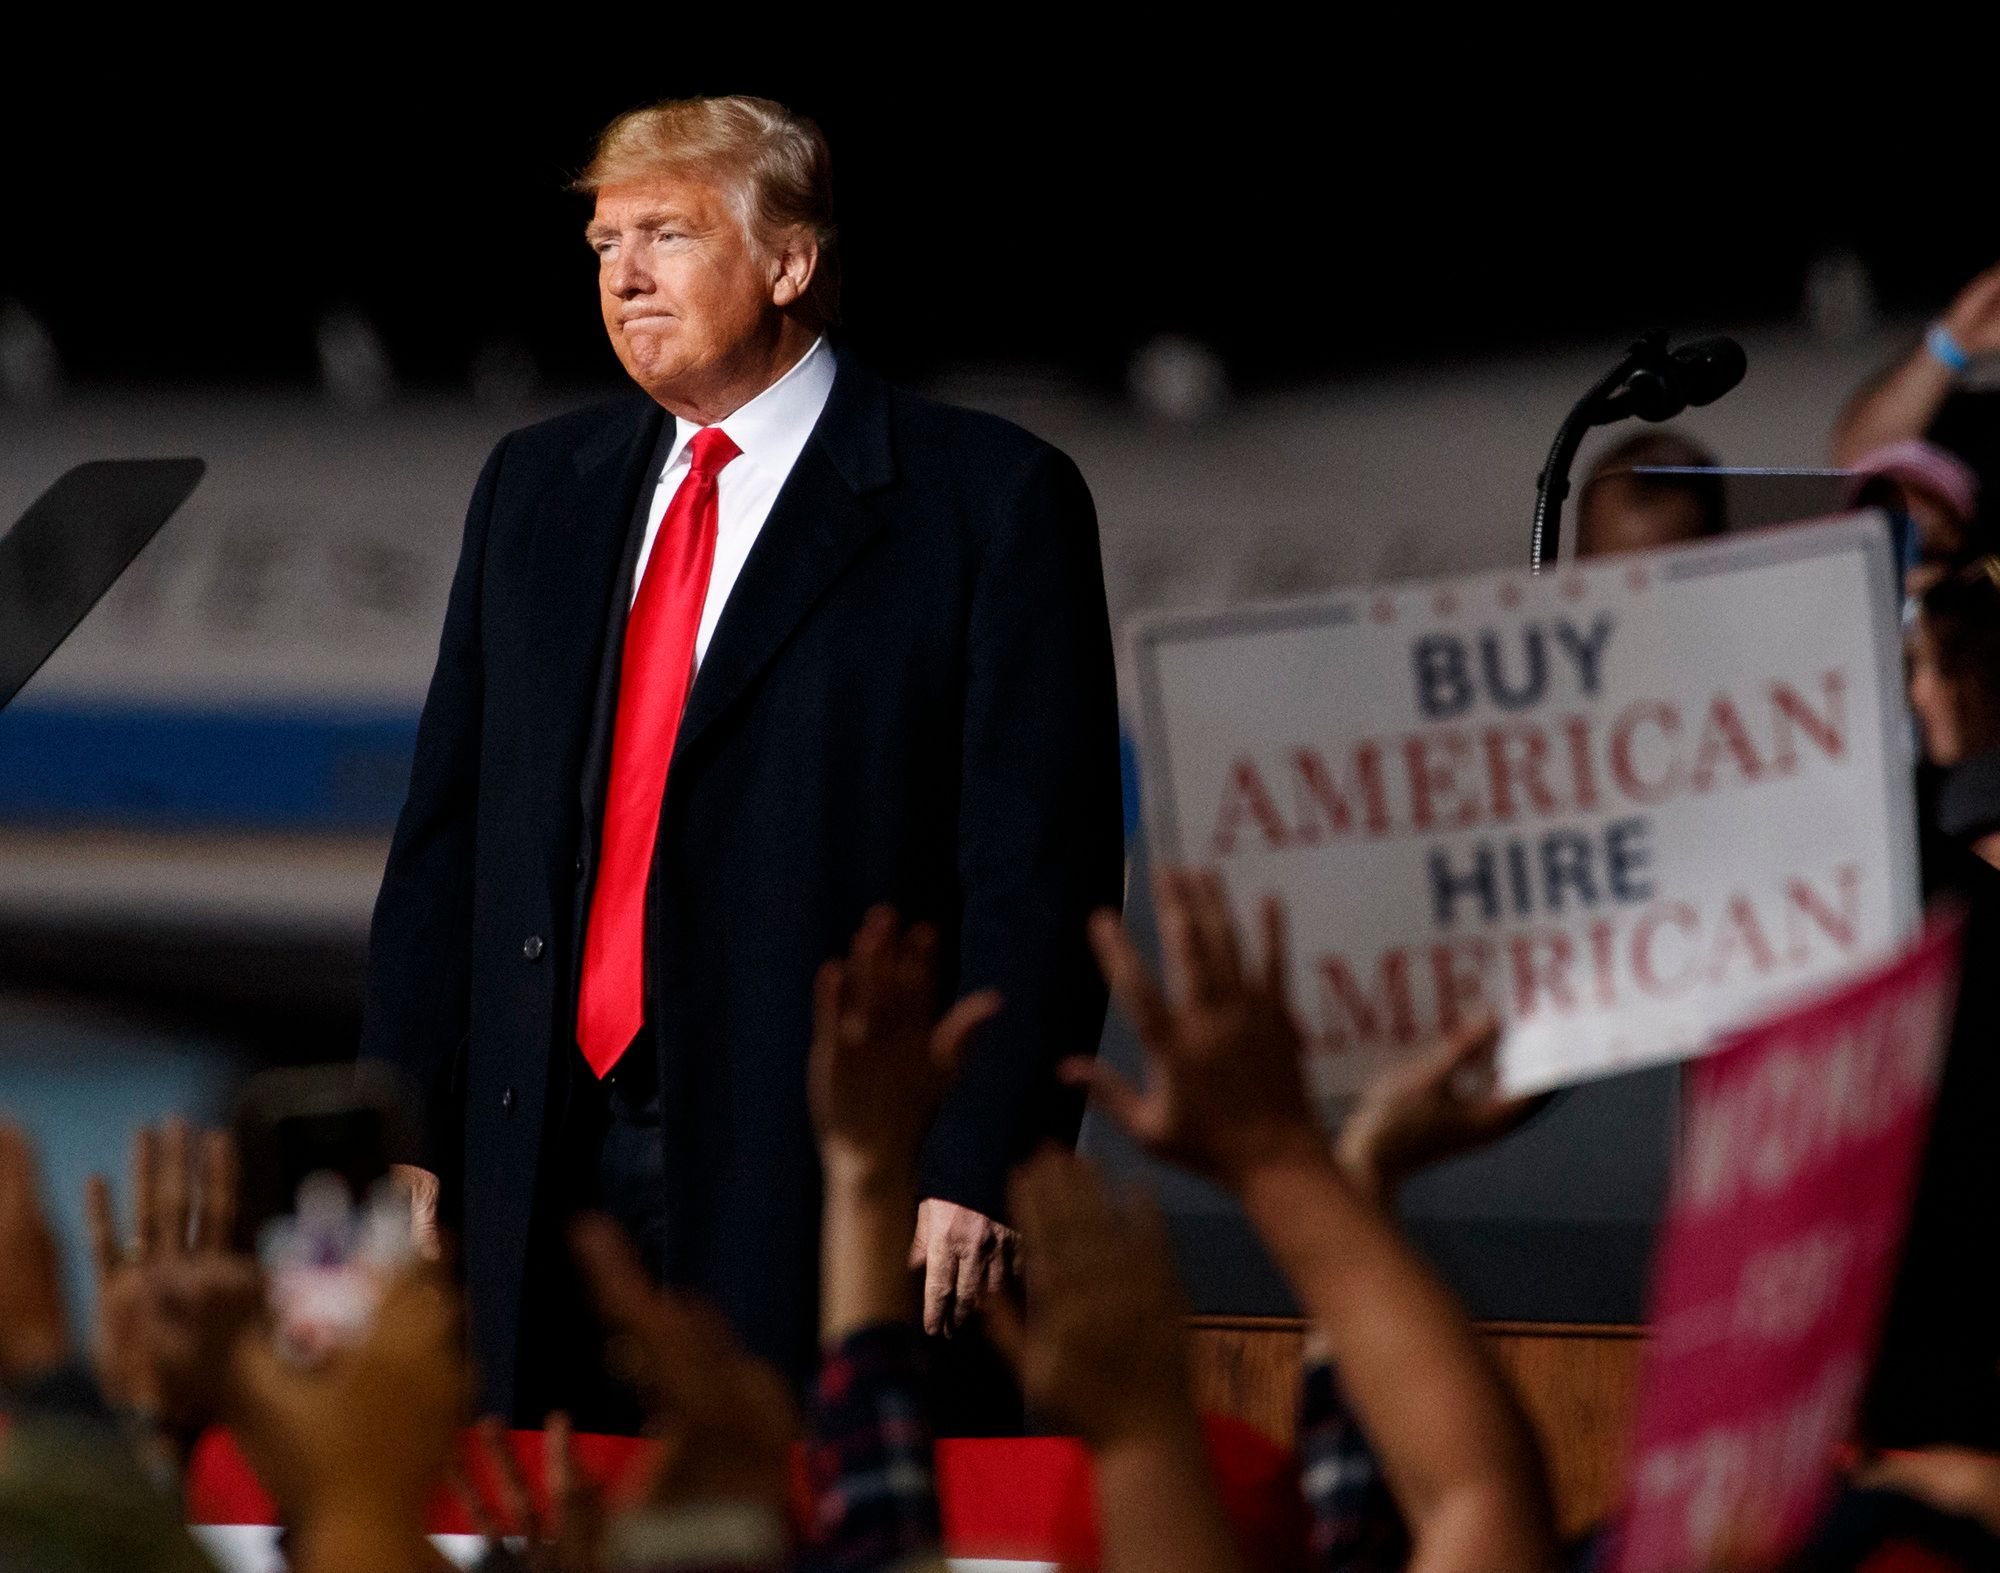 Even Trump's Base Seems To Prefer His Less 'Trumpy'